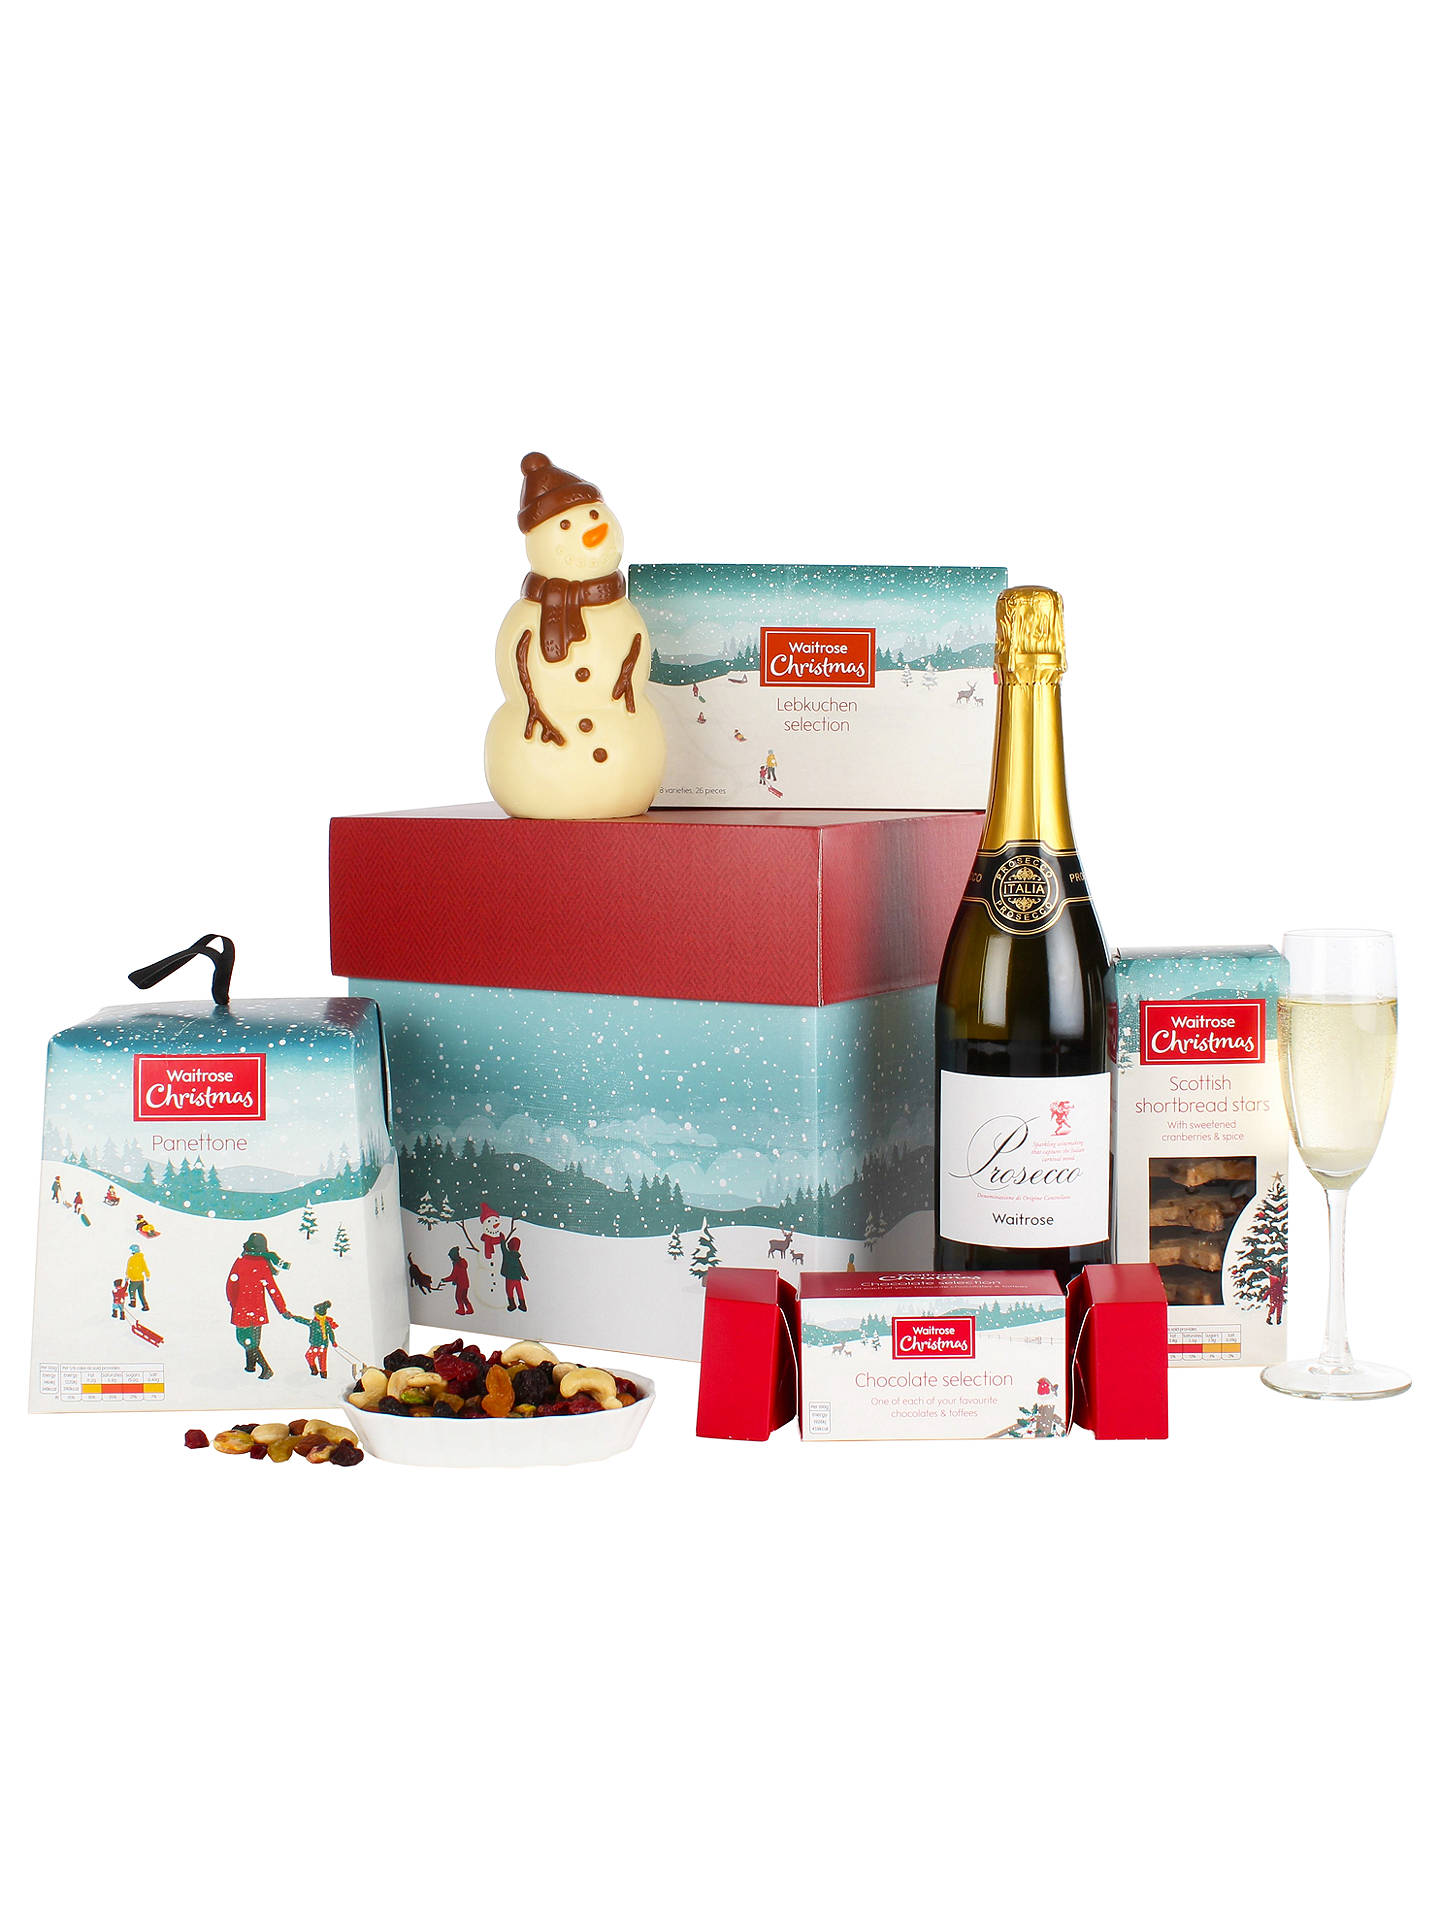 Waitrose Christmas Gift Box at John Lewis & Partners